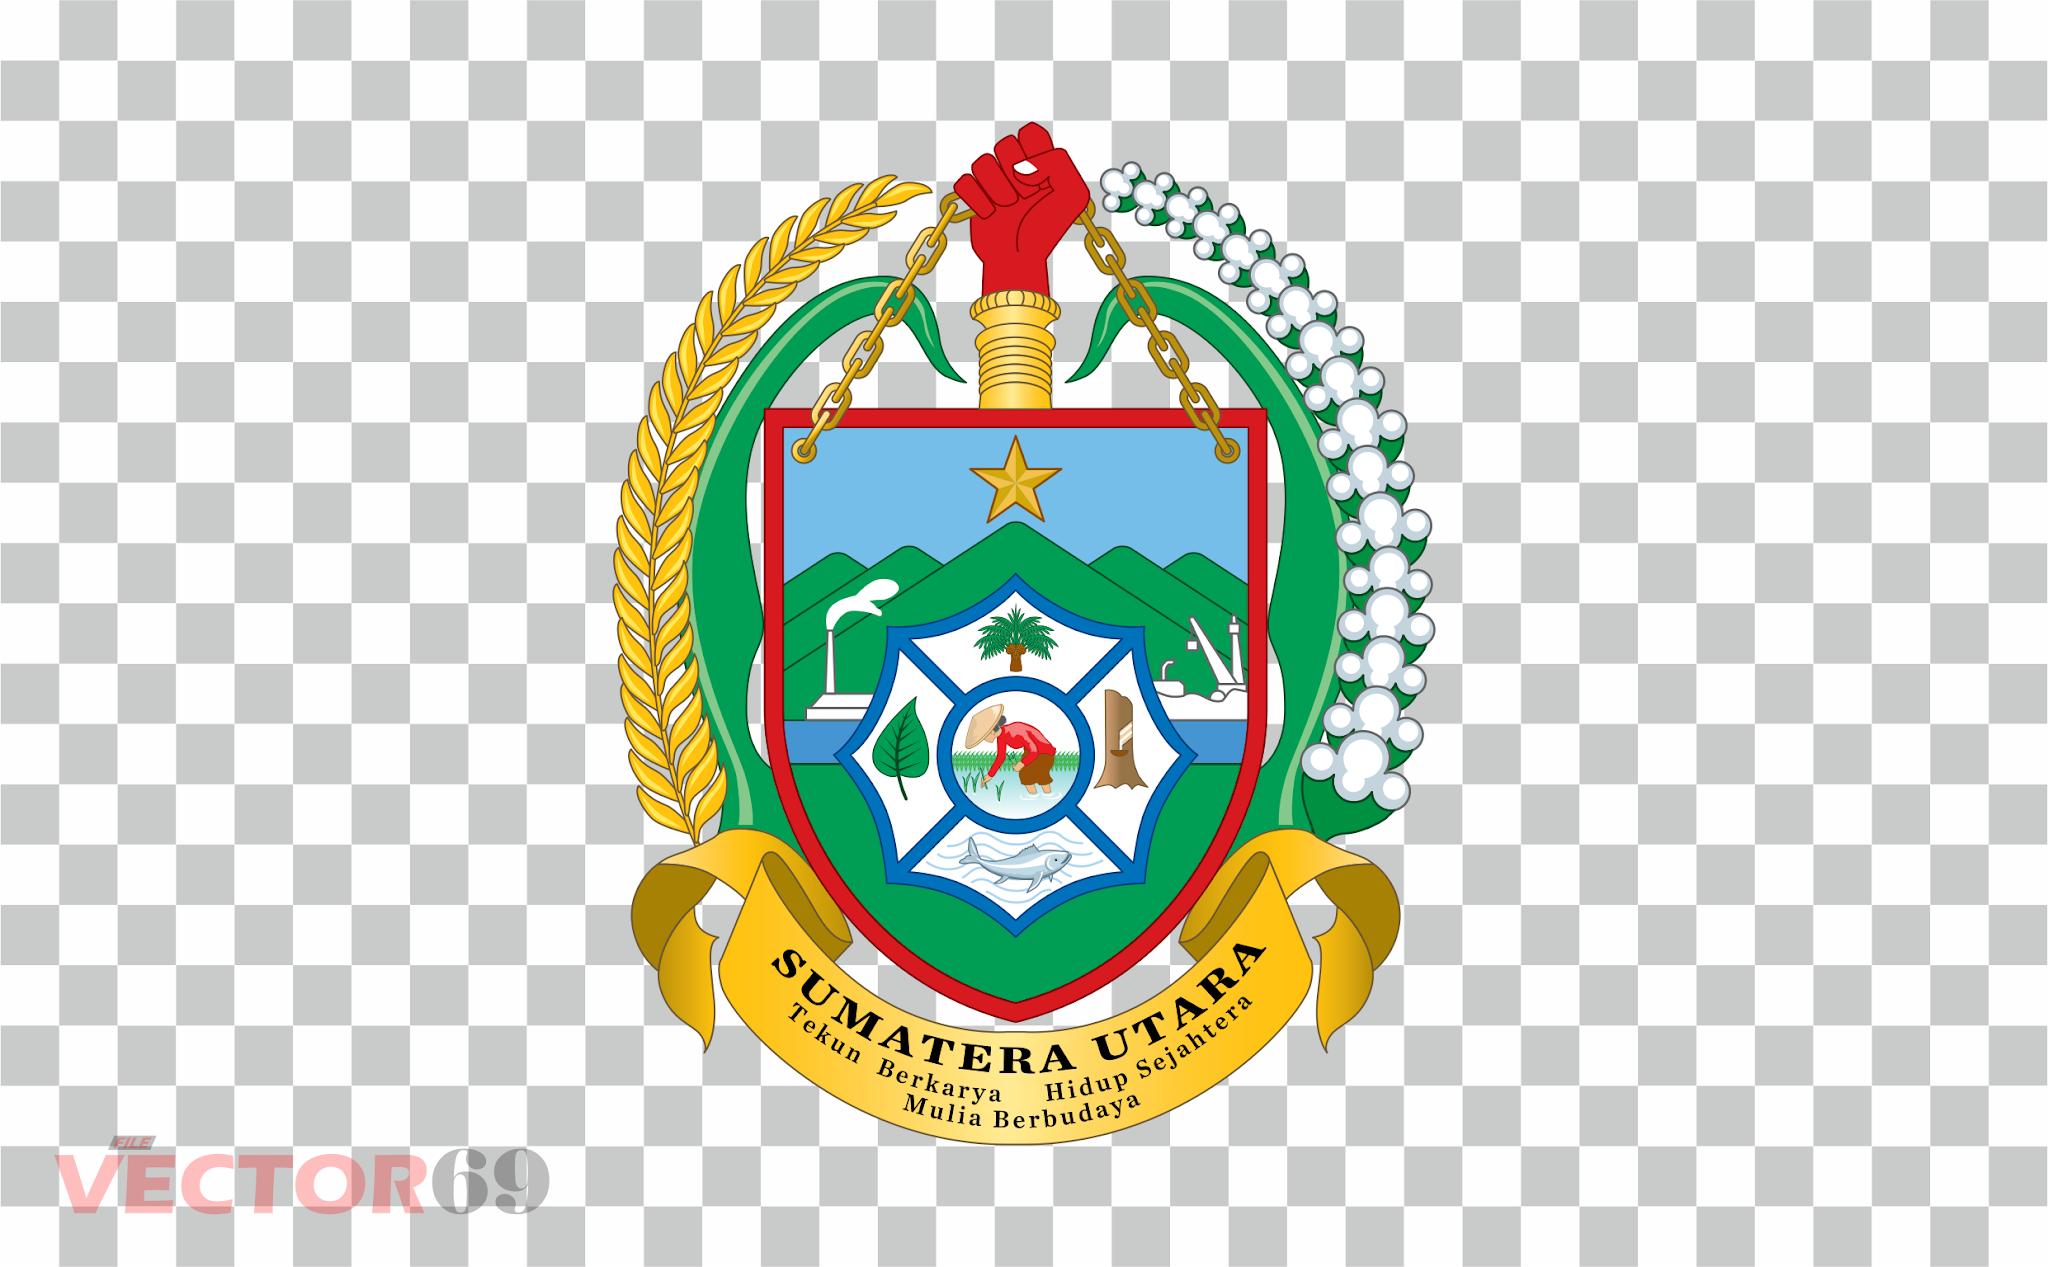 Provinsi Sumatera Utara (Sumut) Logo - Download Vector File PNG (Portable Network Graphics)